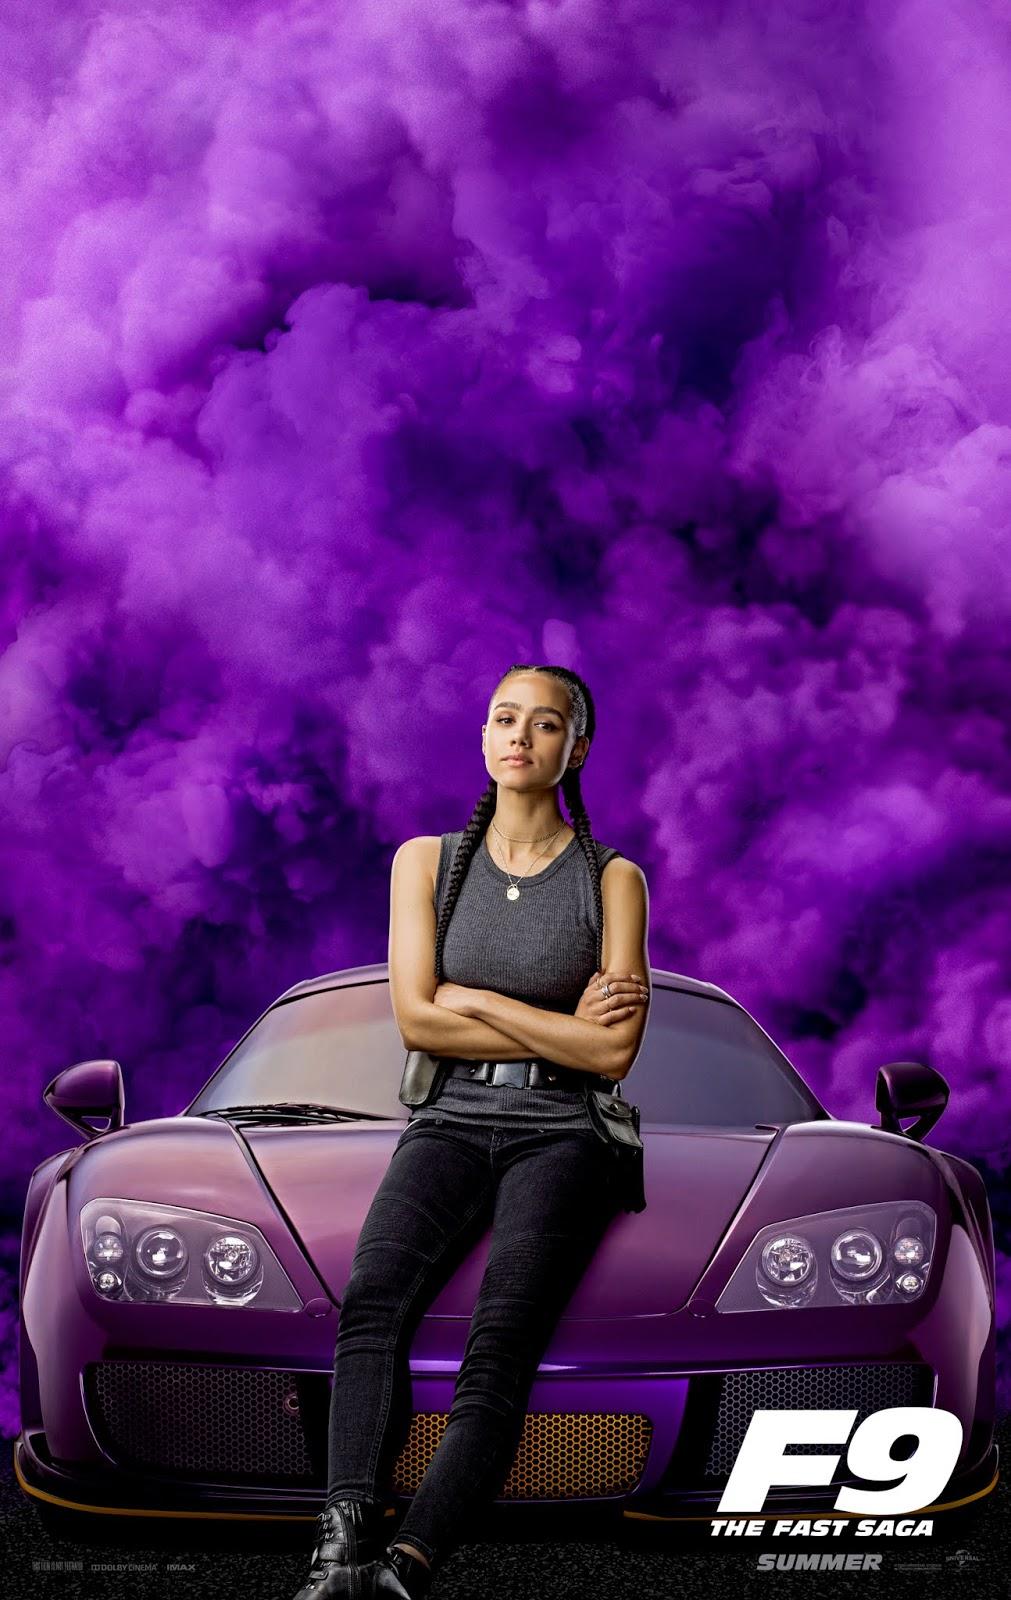 Nathalie Emmanuel - Fast and Furious 9